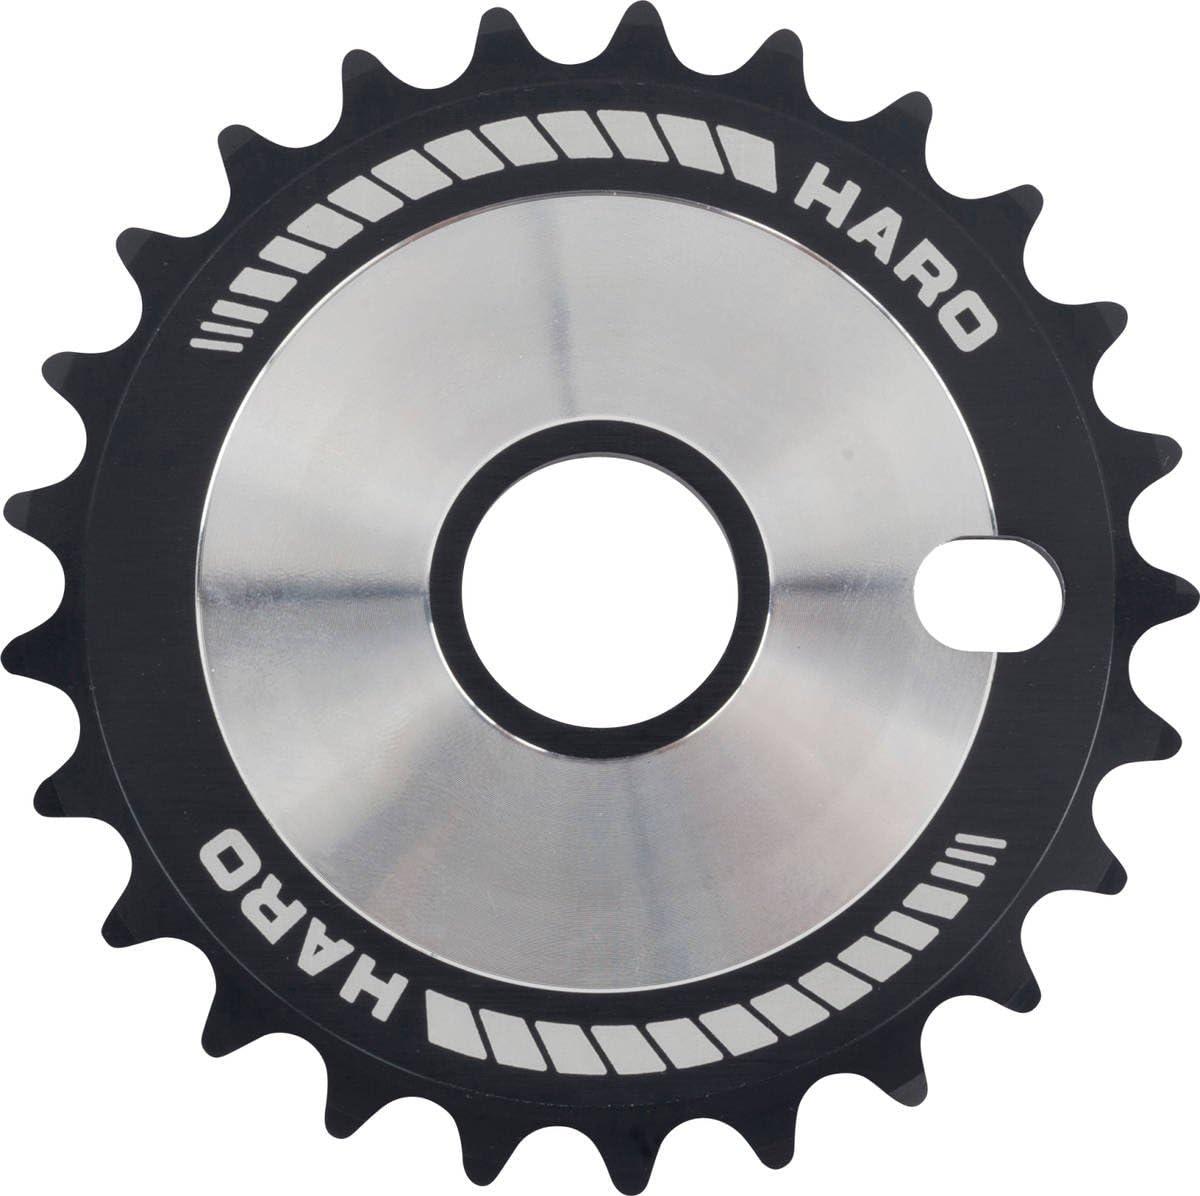 Haro Team Vintage Chainring Disc Sprocket